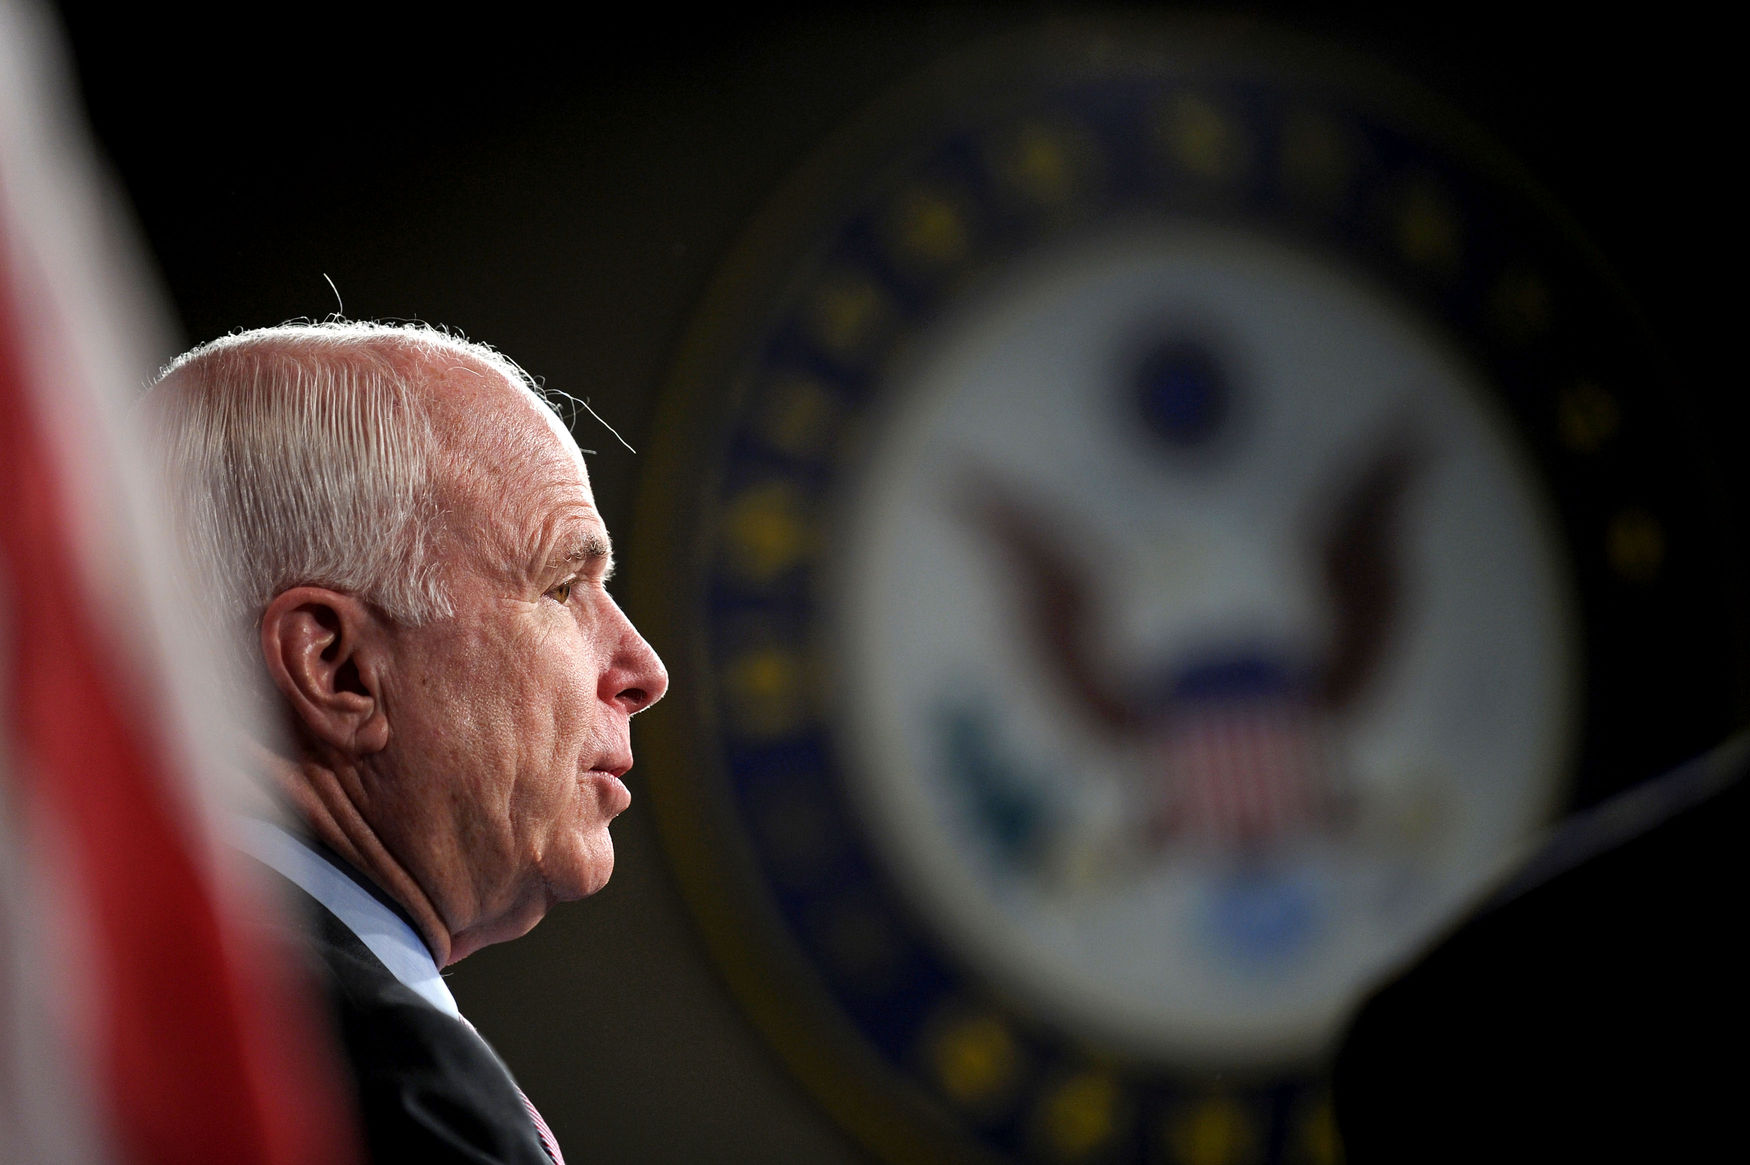 Senators McCain and Graham speak on the Hagel and Brenner nominations in Washington